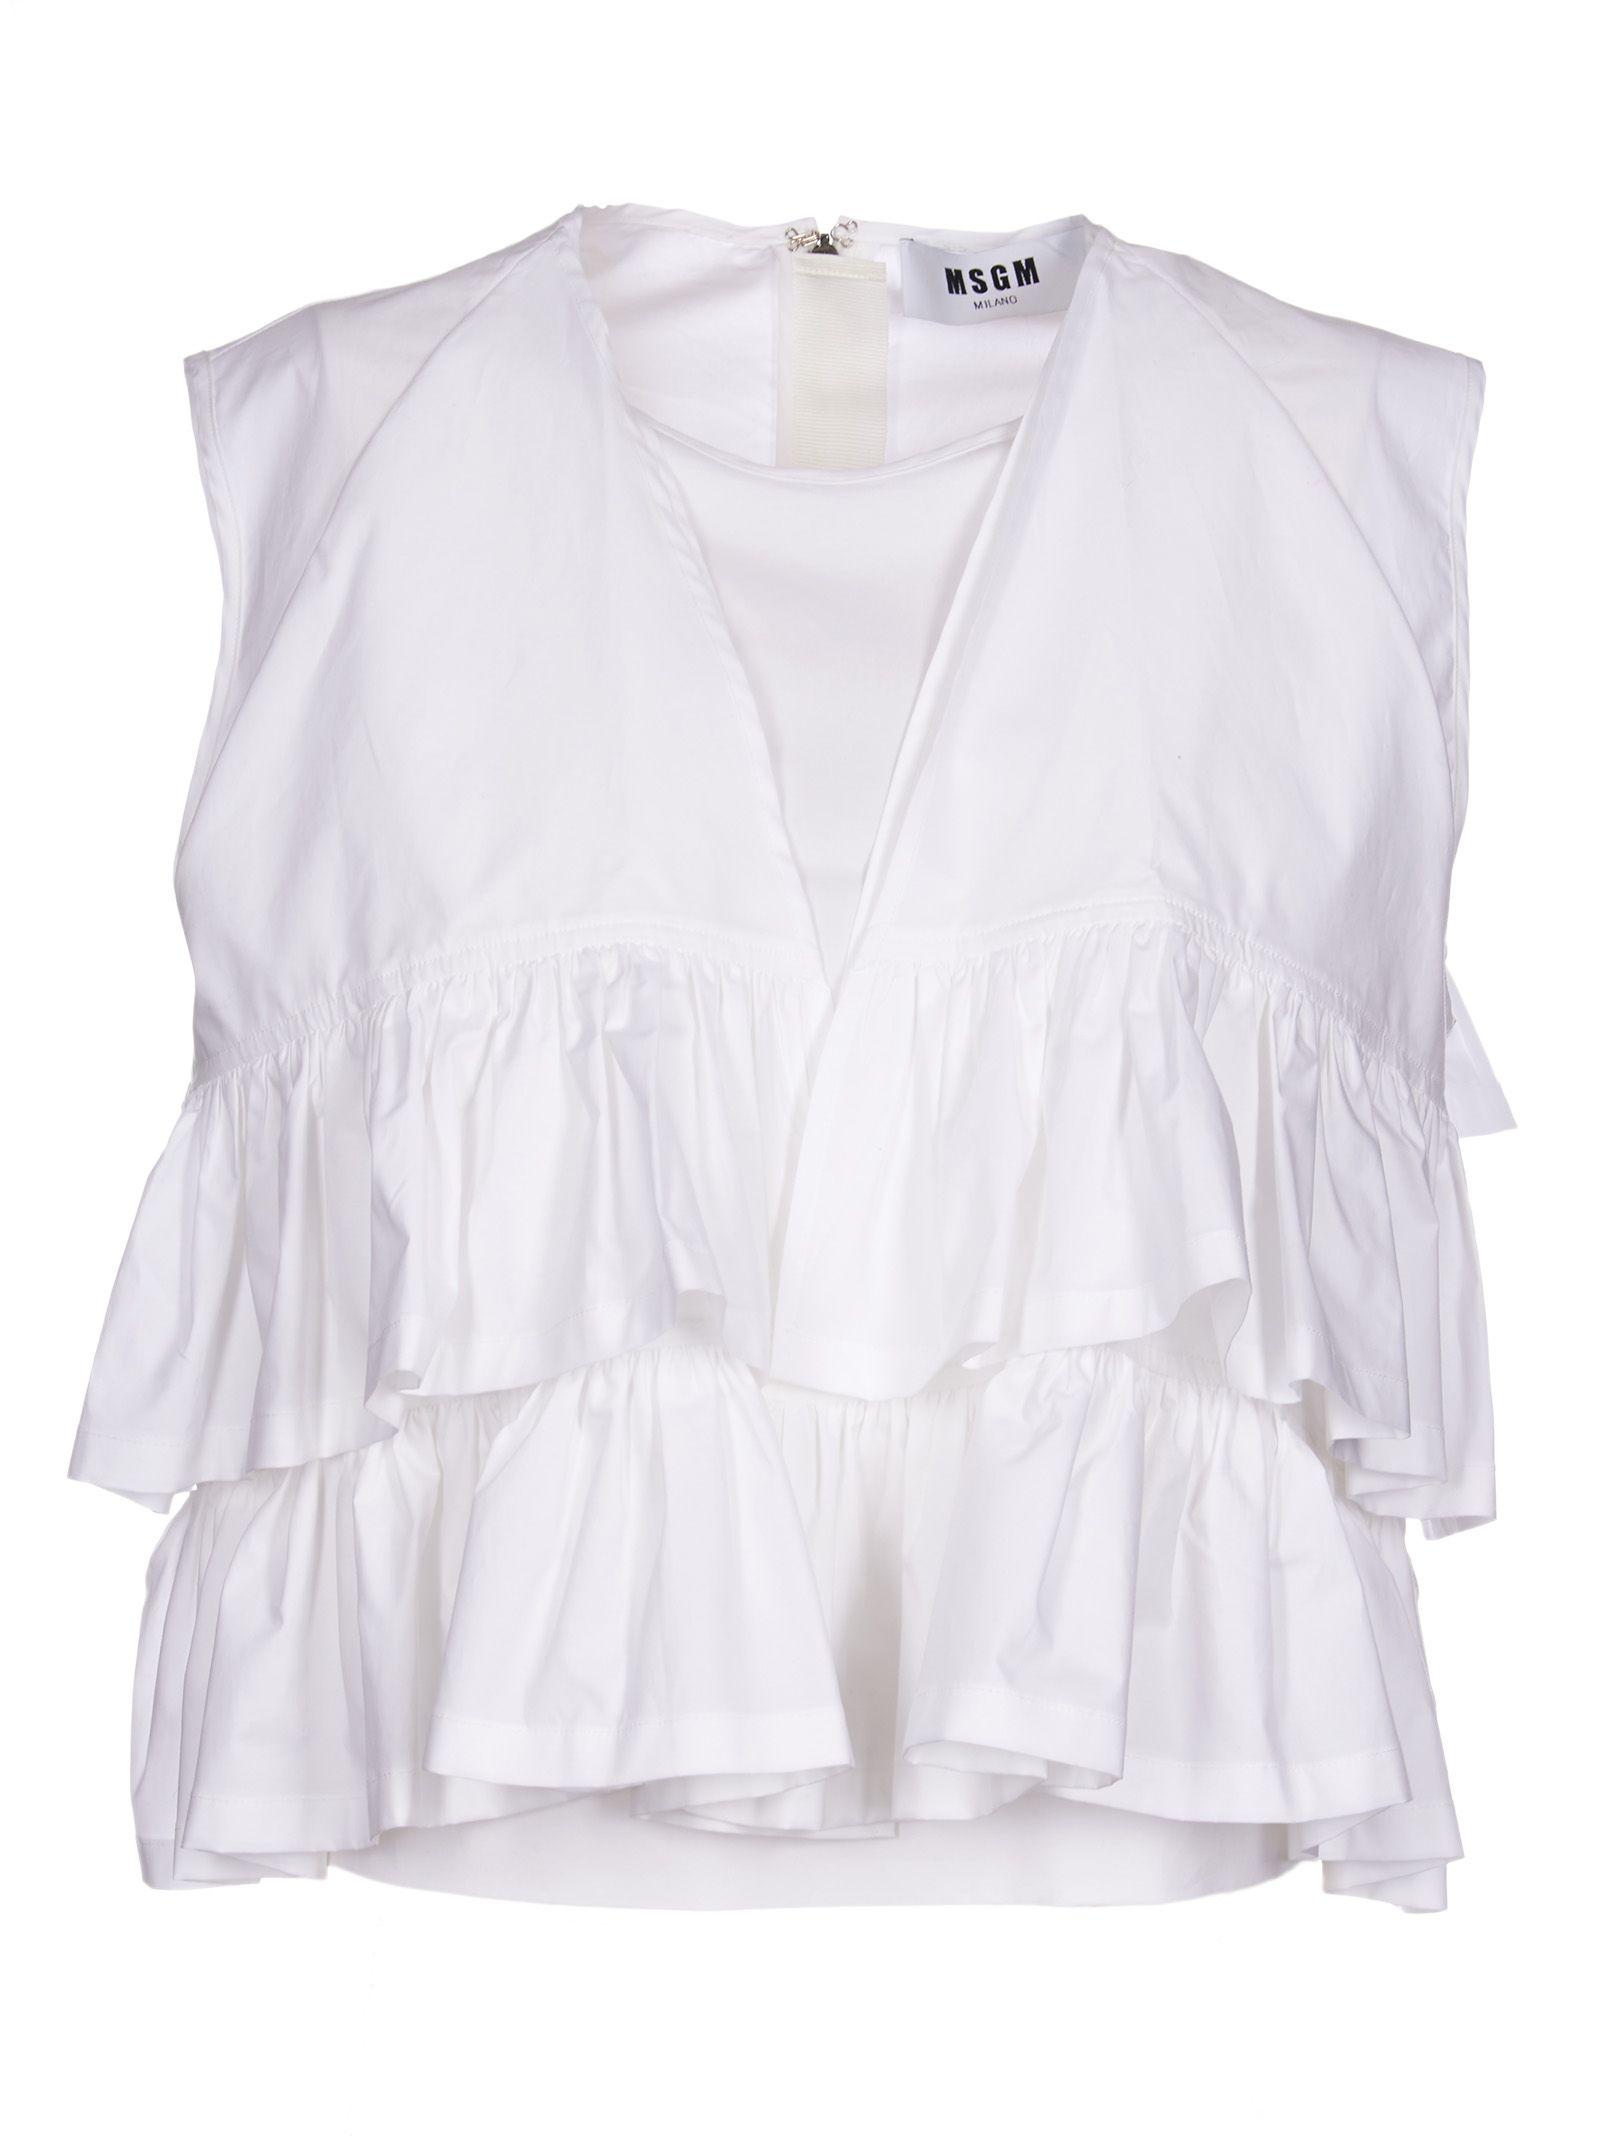 aadebfa7c71 MSGM MSGM Layered Ruffle Cropped Blouse - White - 10532850 | italist